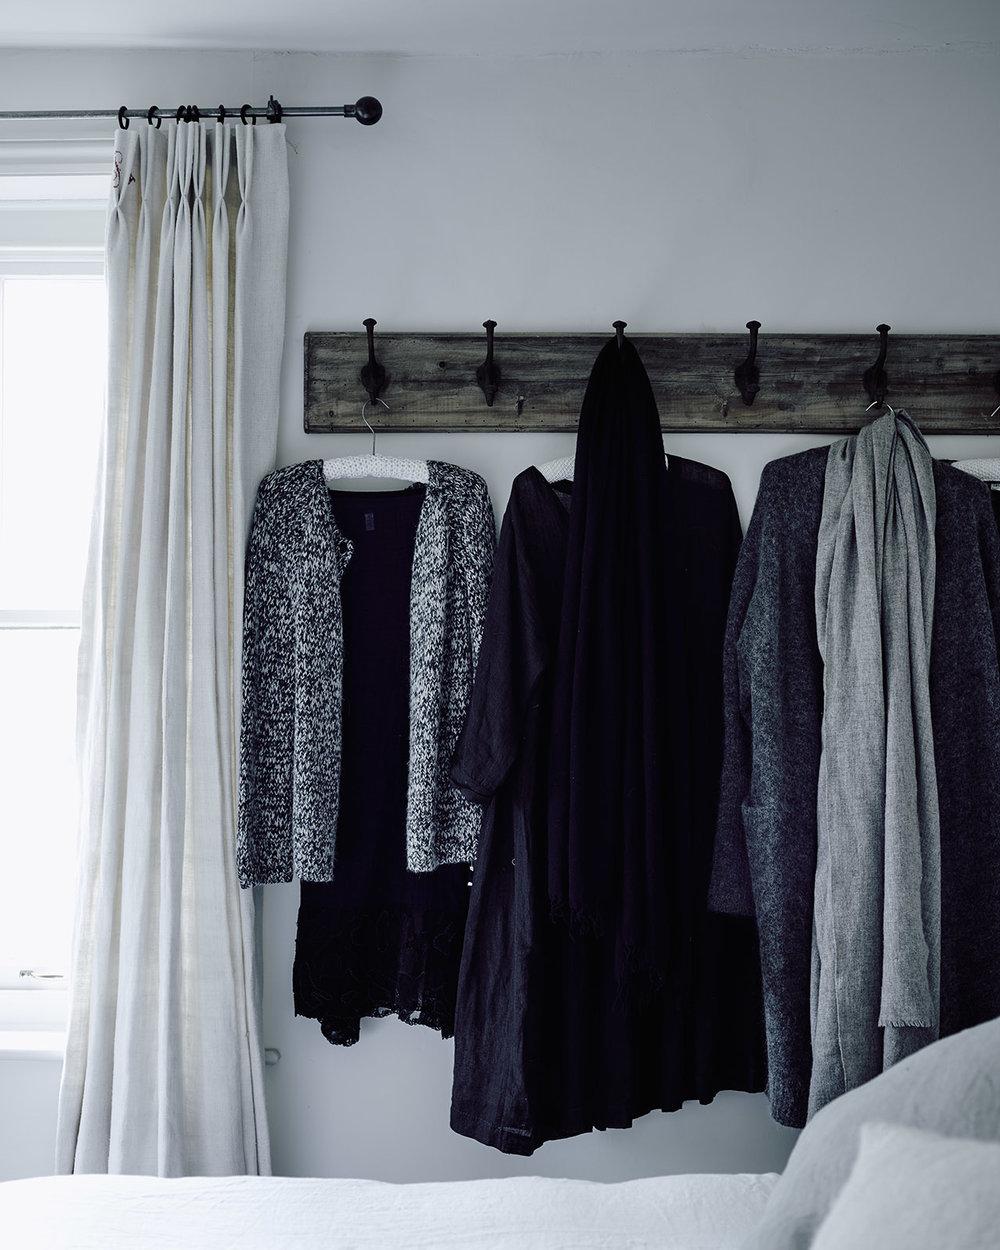 141017-SLM-Home-Bedroom-002-web-1600-px.jpg